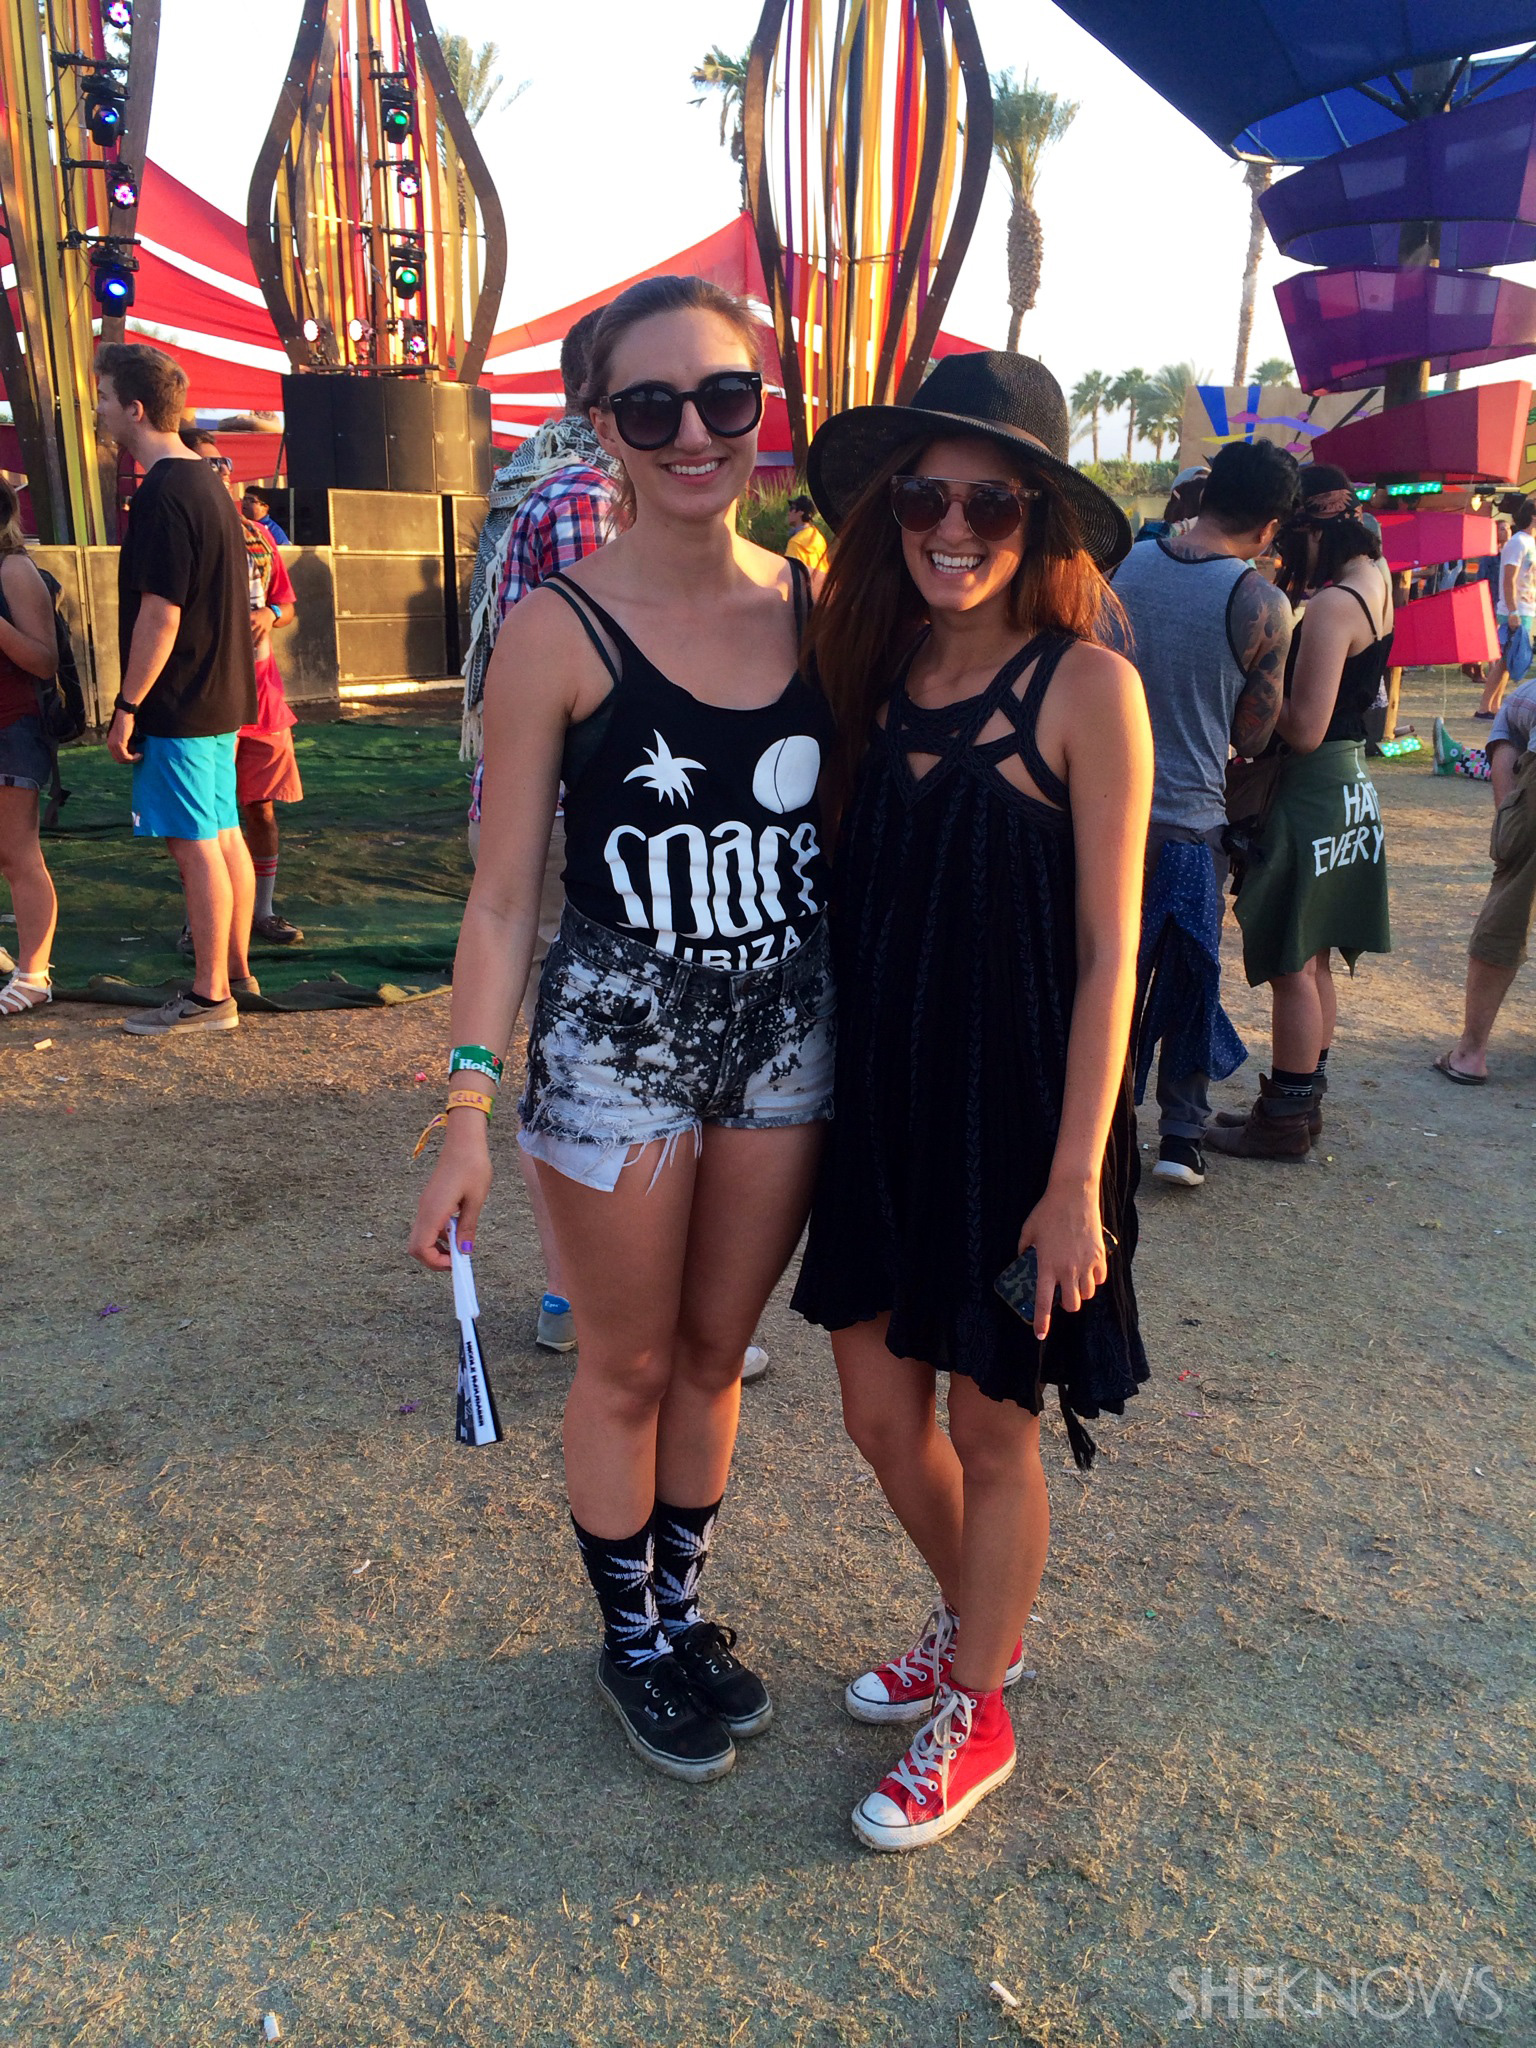 Coachella 2014 Fashion